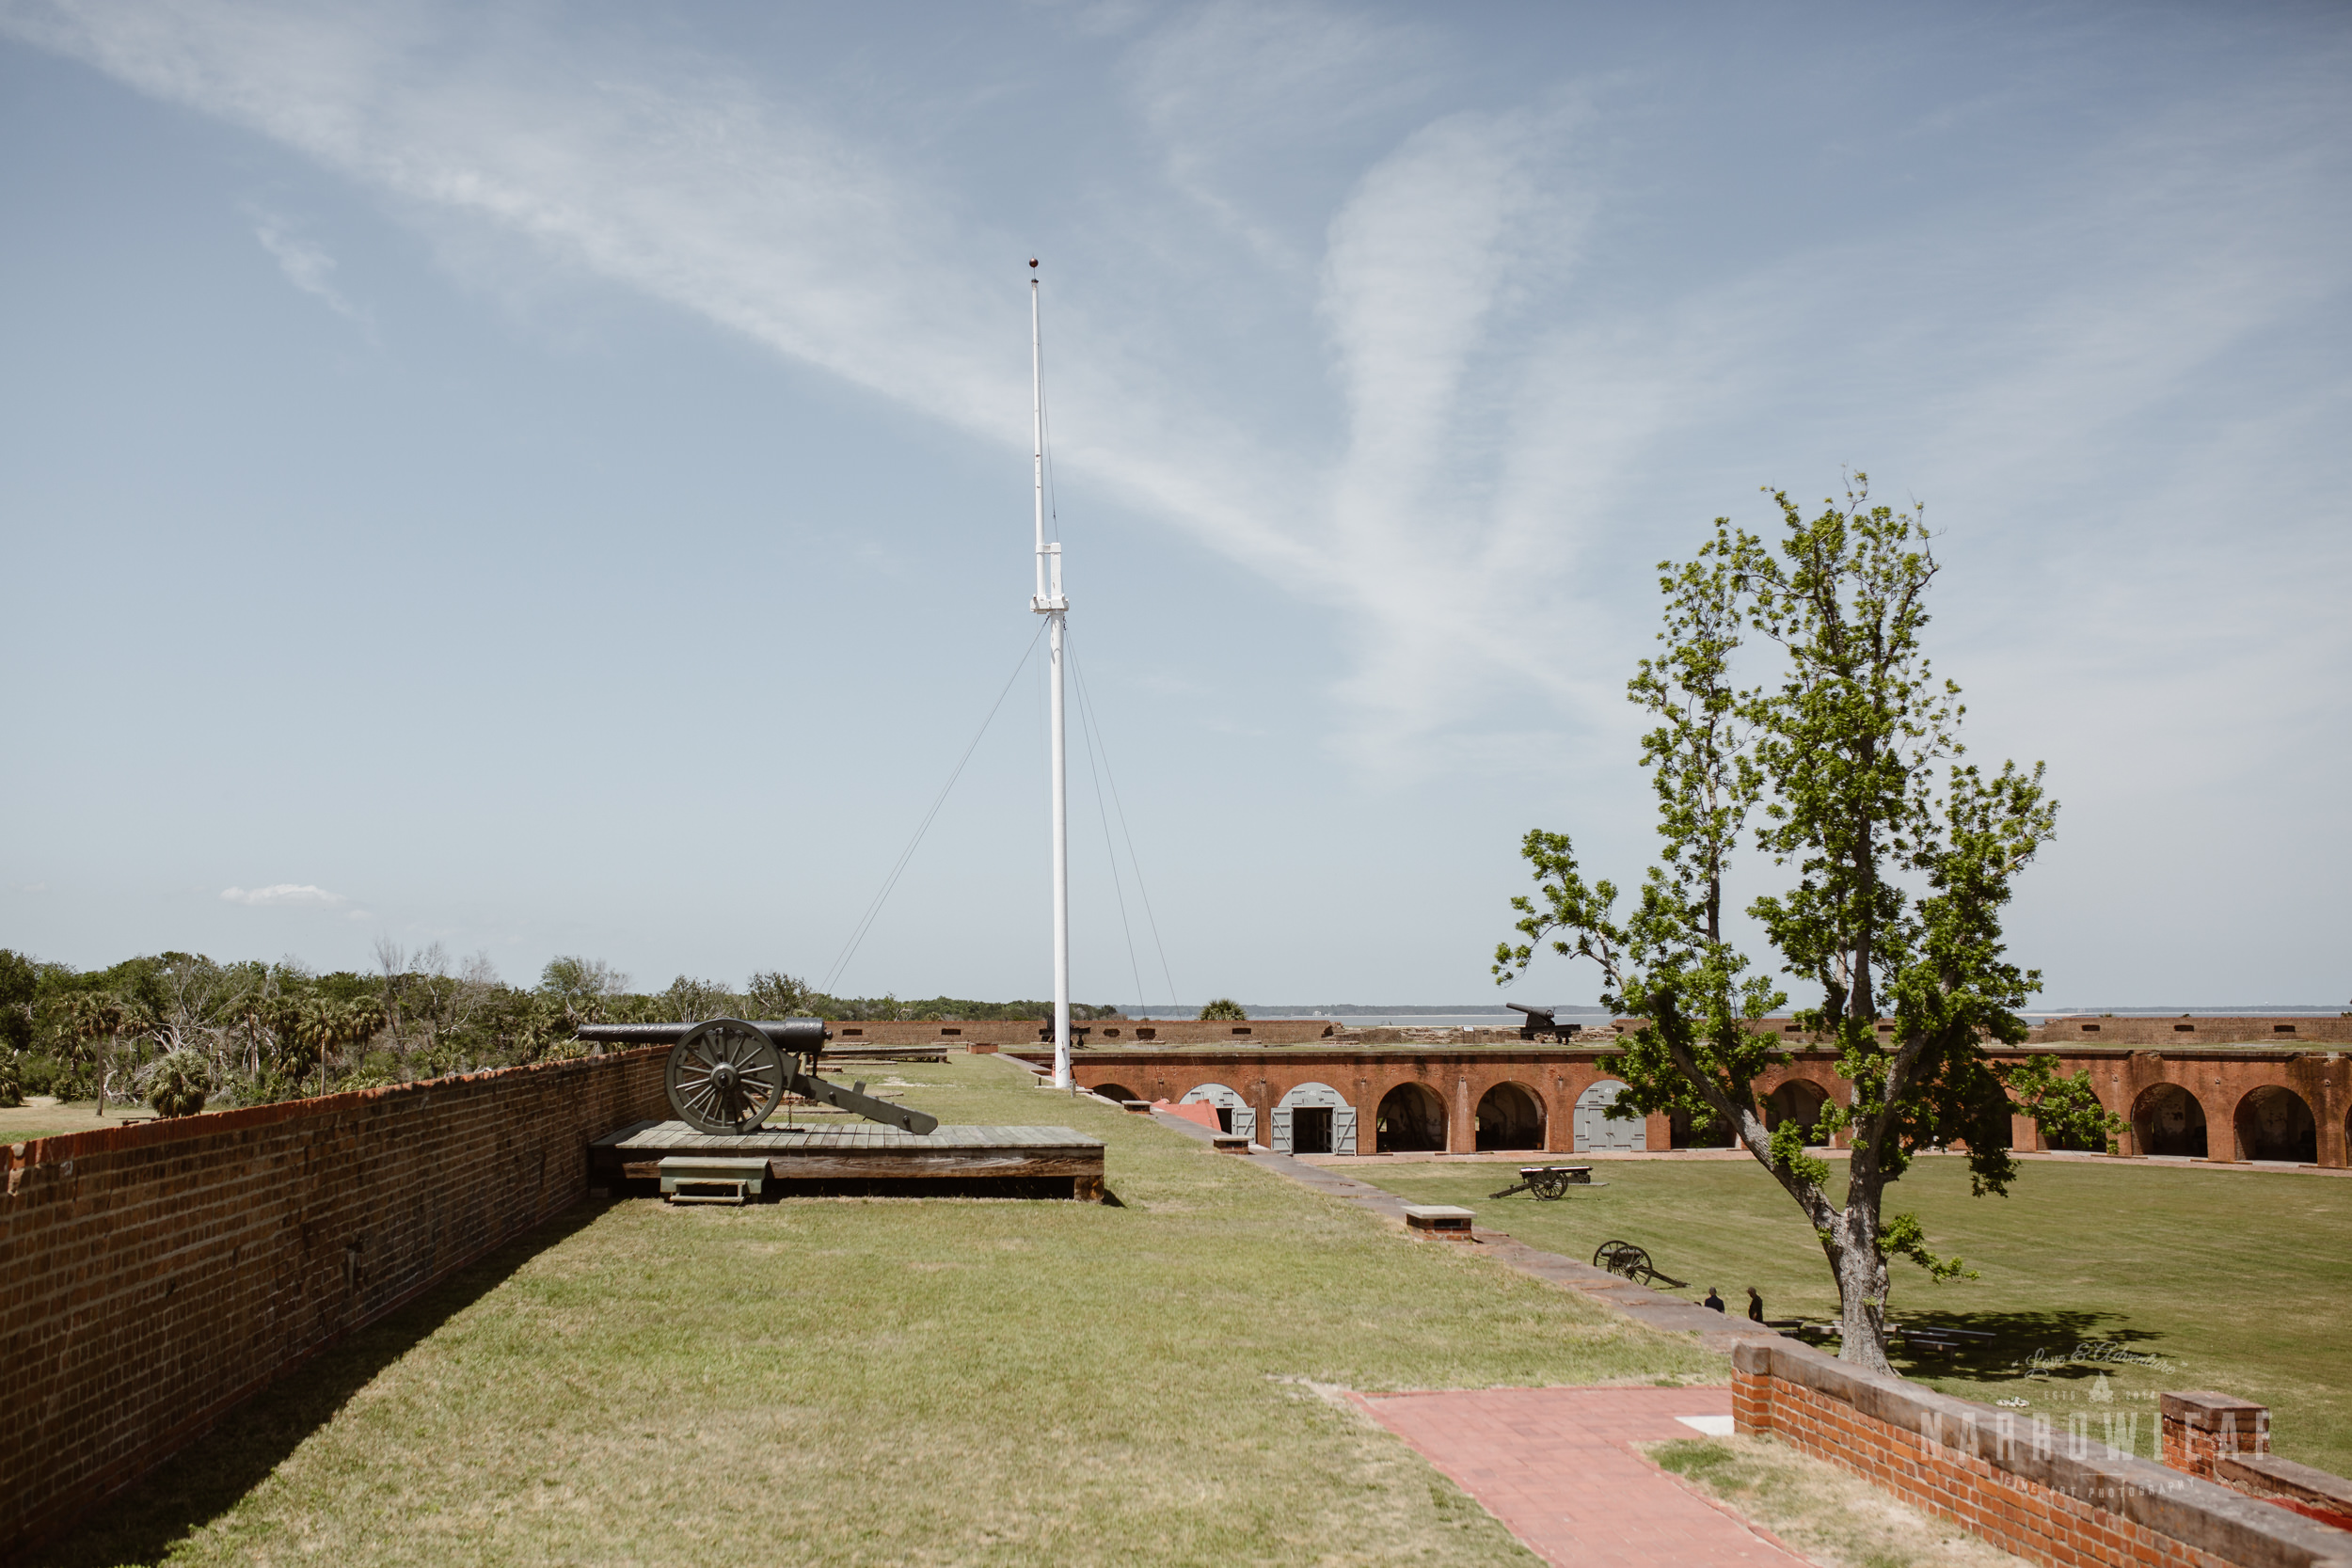 Fort-Pulaski-National-Monument-elopement-photographer-Narrowleaf_Love_and_Adventure_Photography-1.jpg